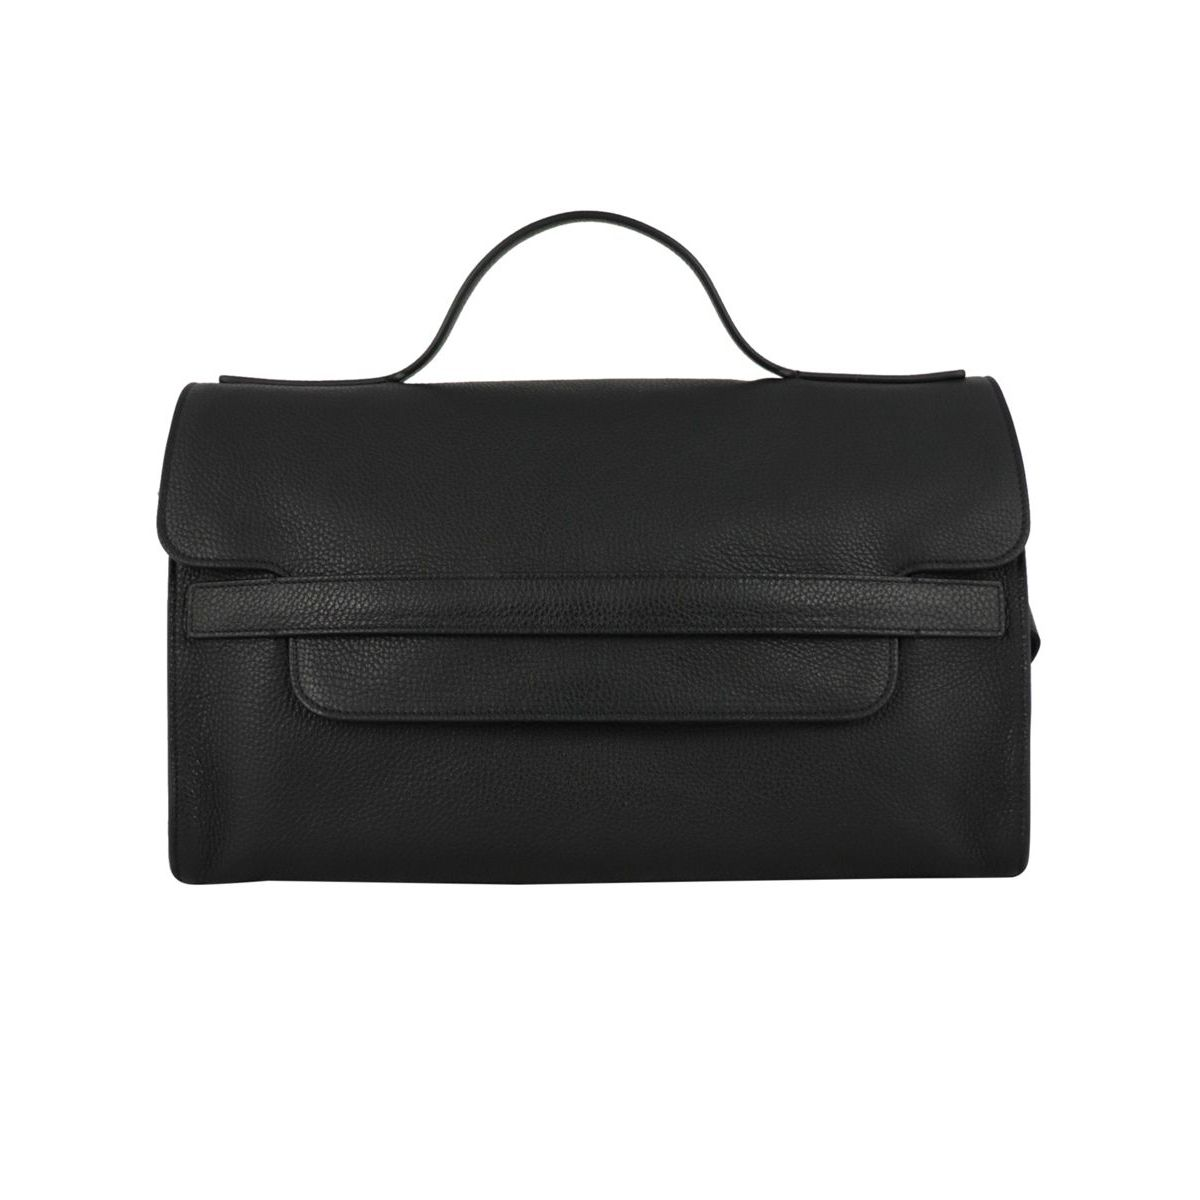 Nina bag with shoulder strap Black Zanellato